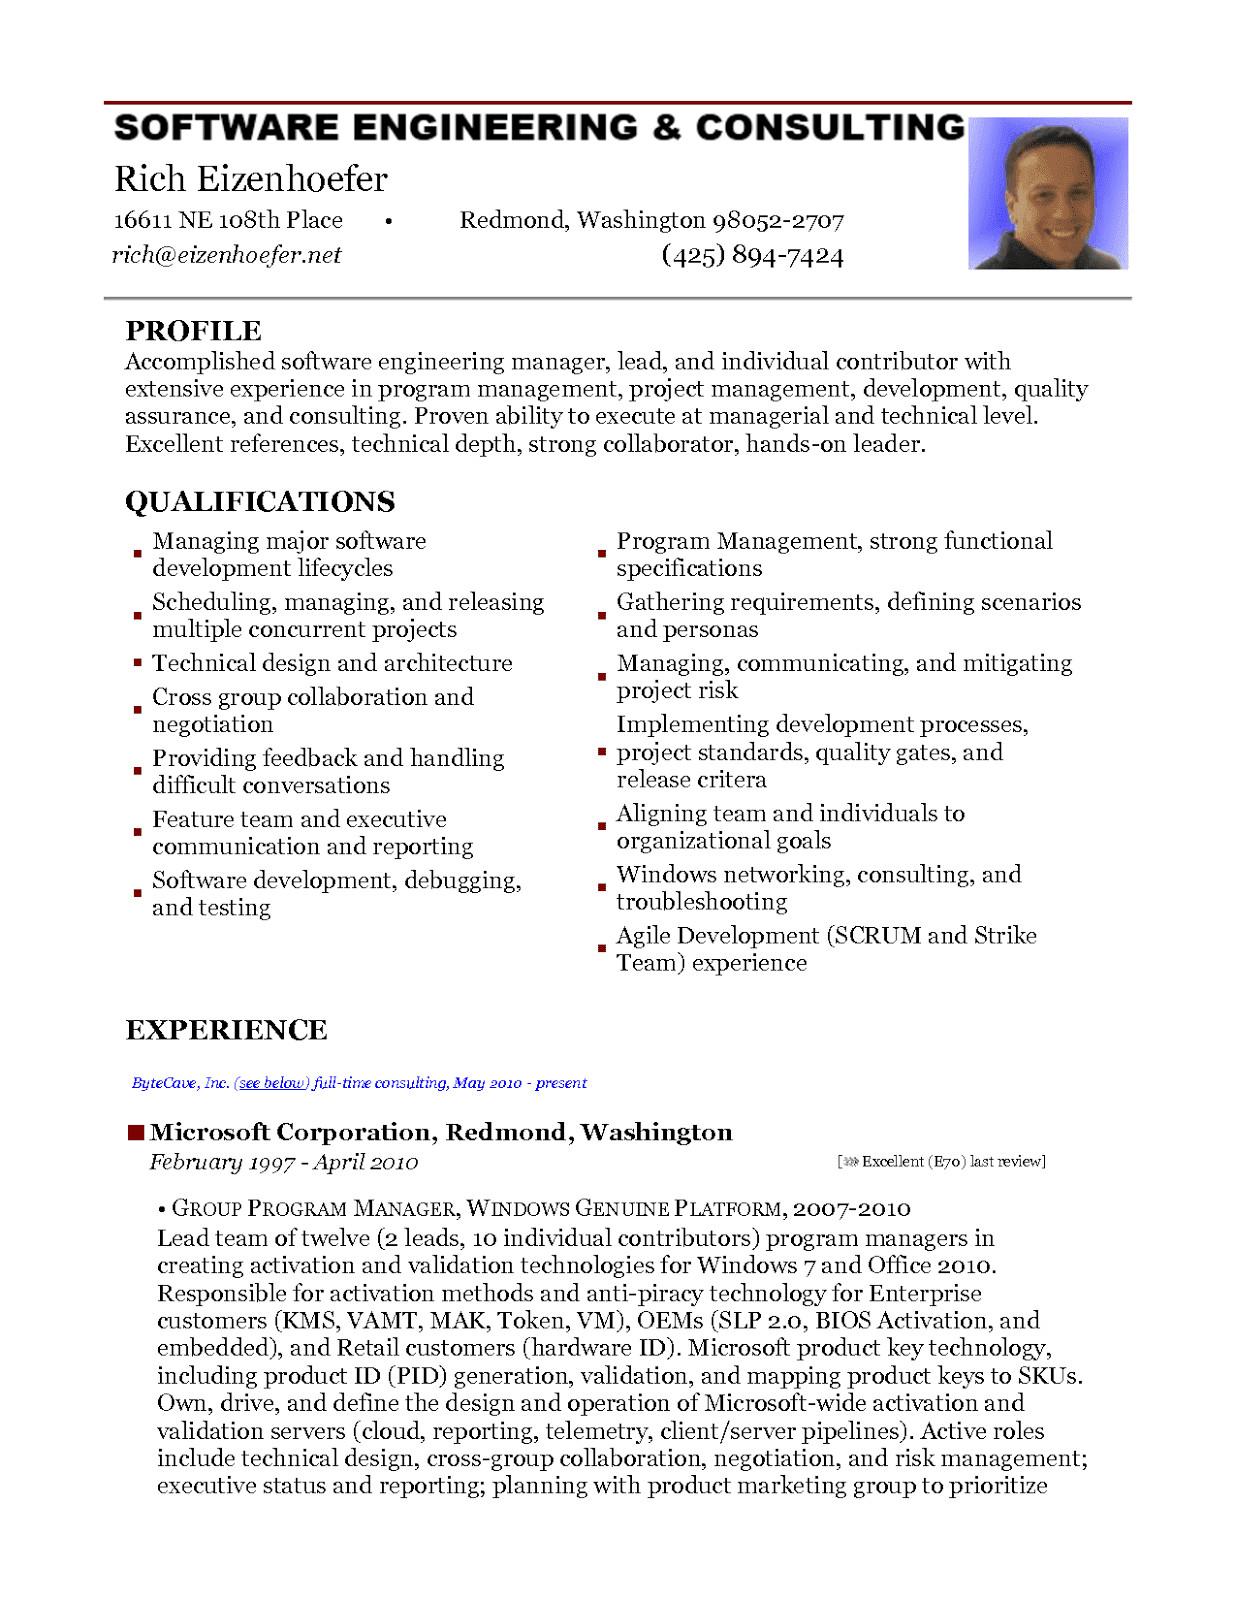 2 years experience resume